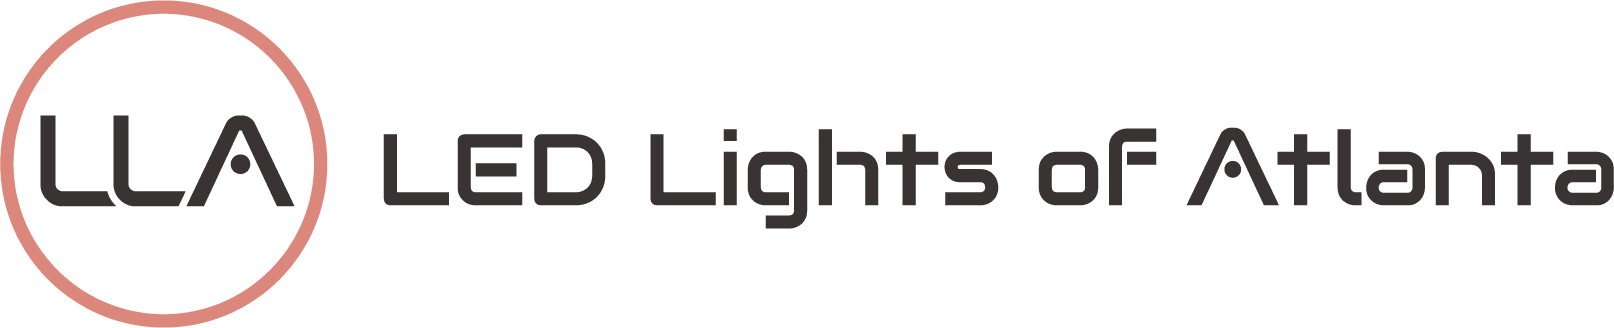 LED Lights of Atlanta